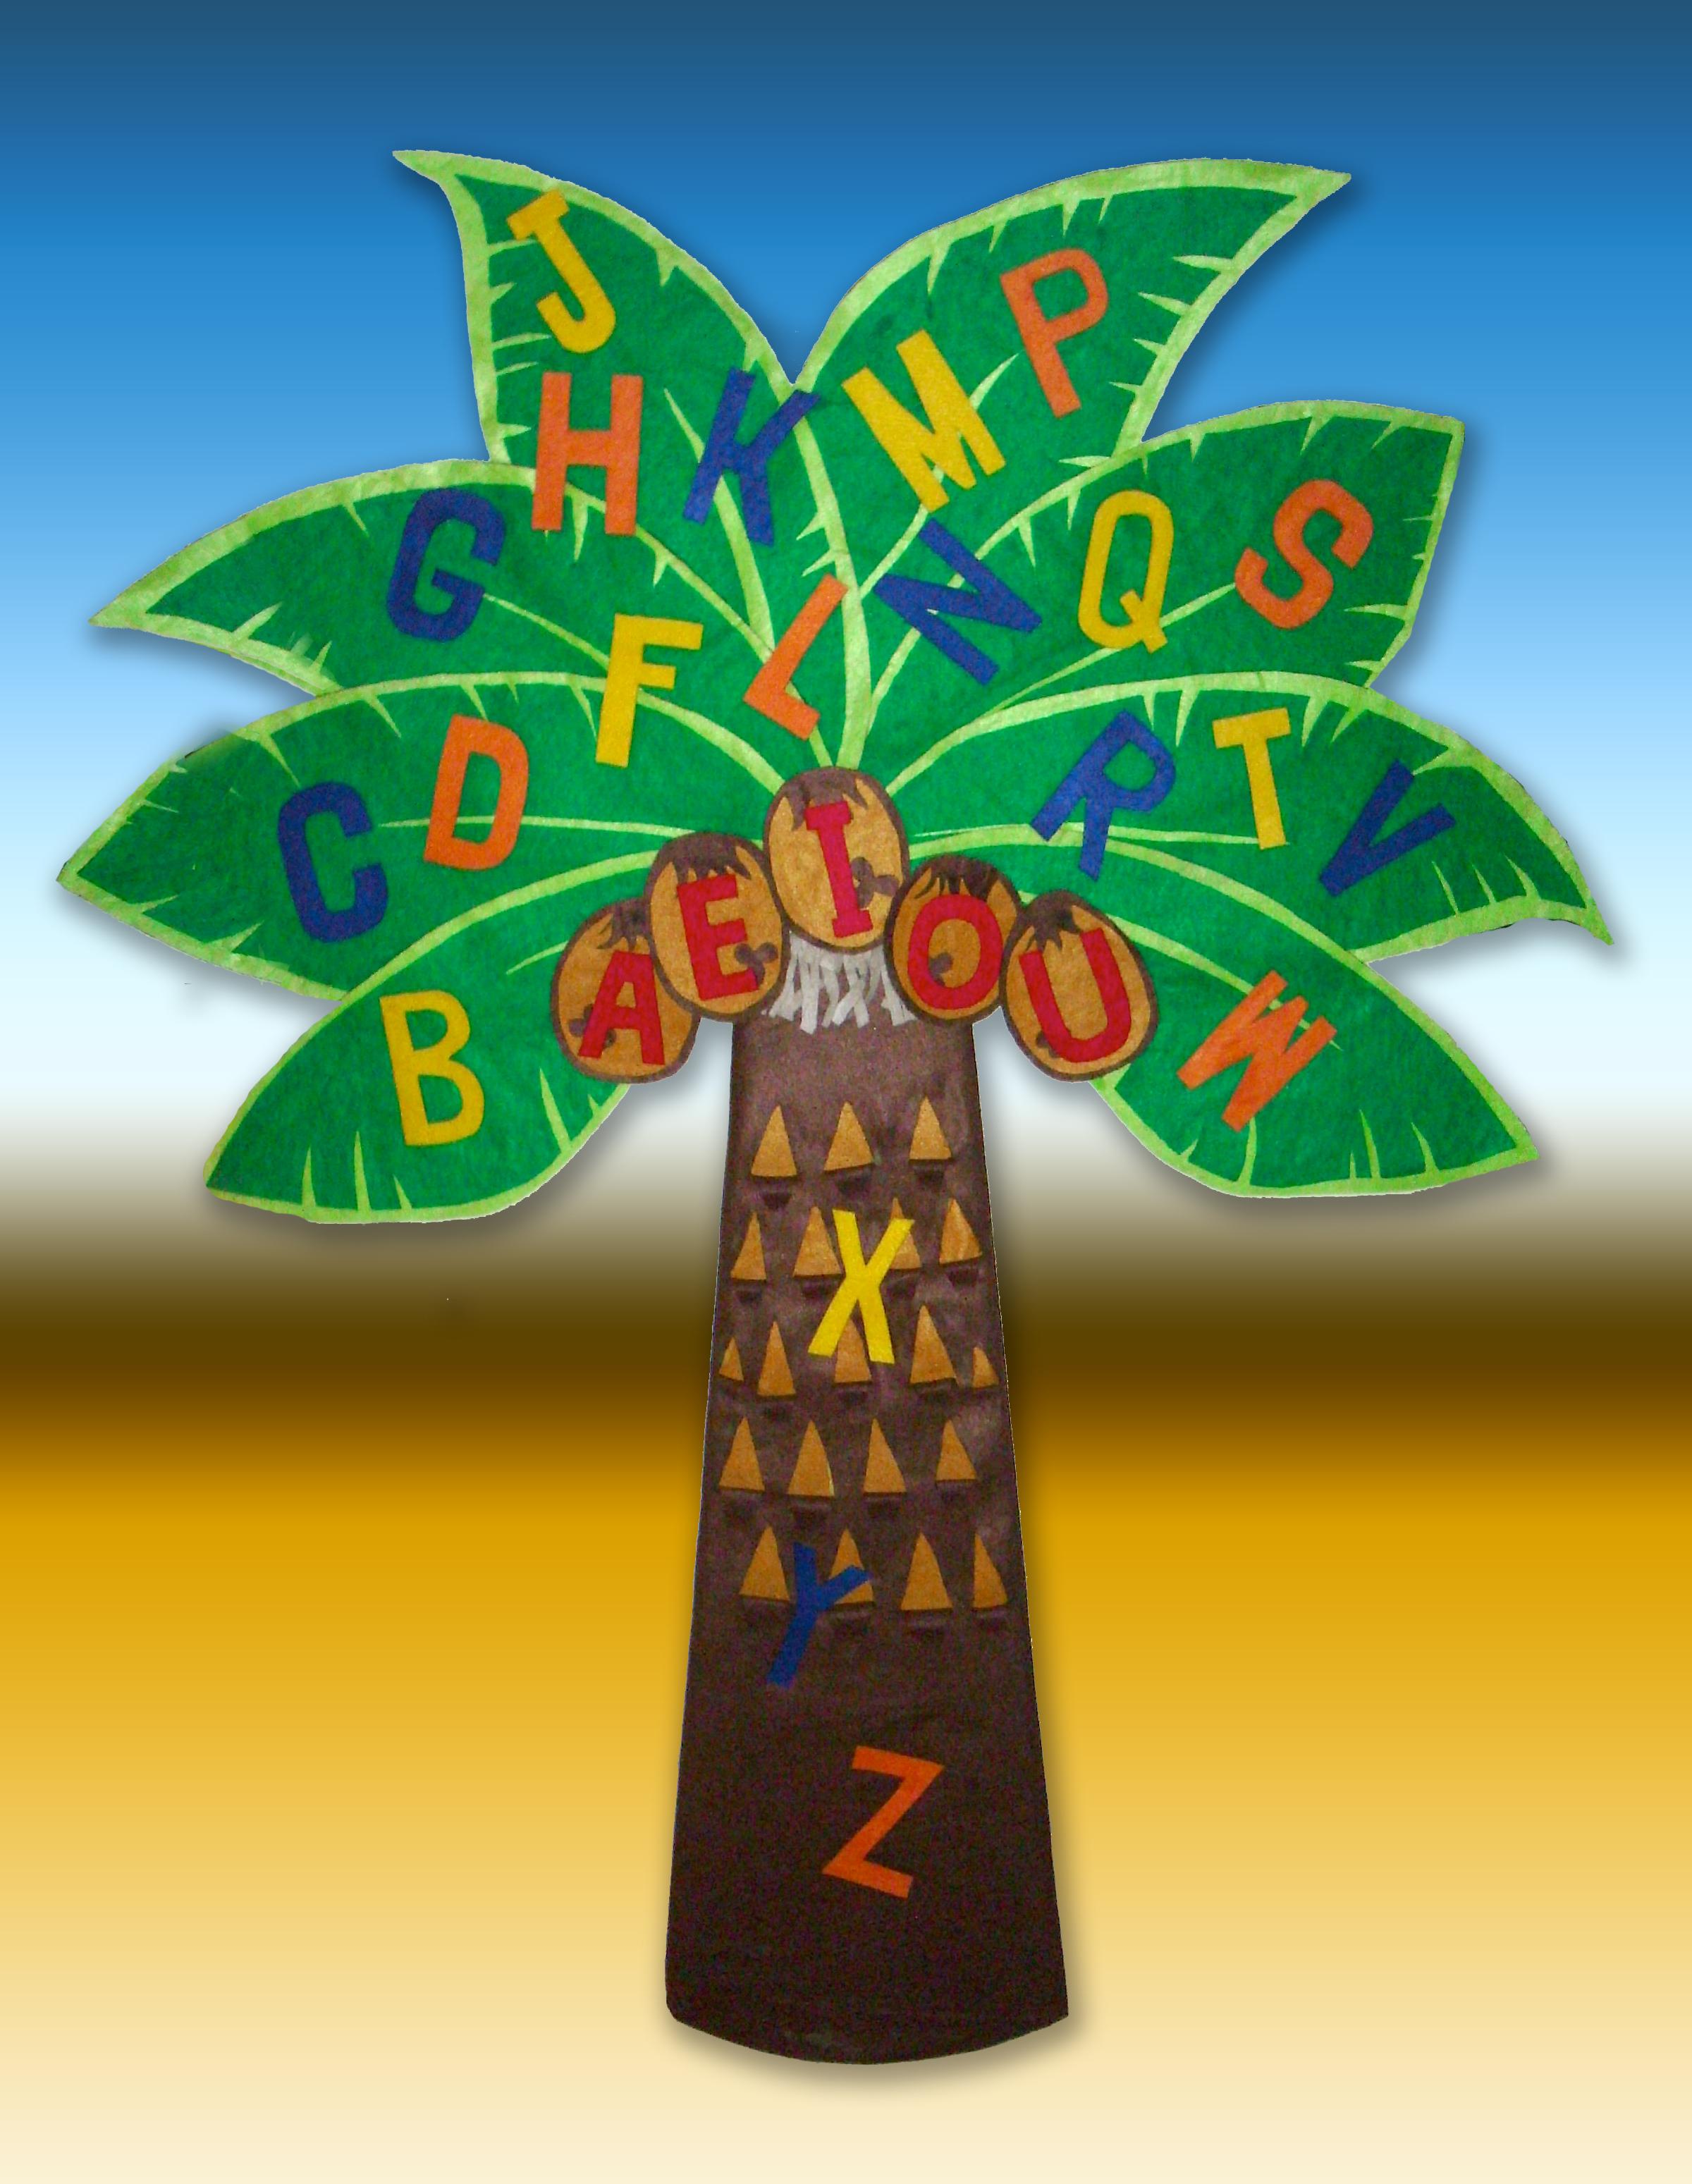 Chica Chica boom Boom Tree